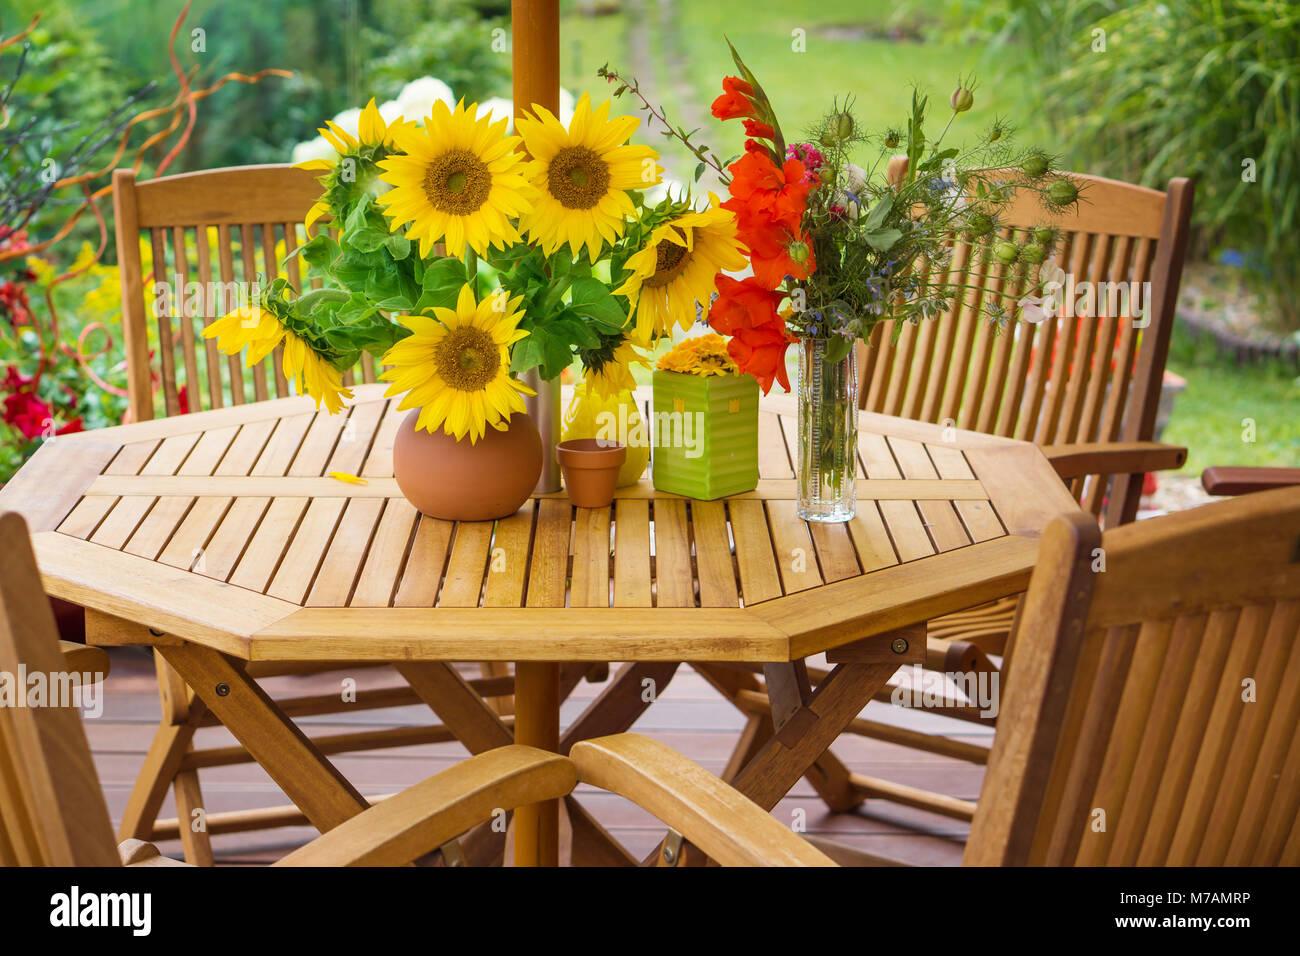 Blumengarten Terrasse Tisch Stockfotos Blumengarten Terrasse Tisch